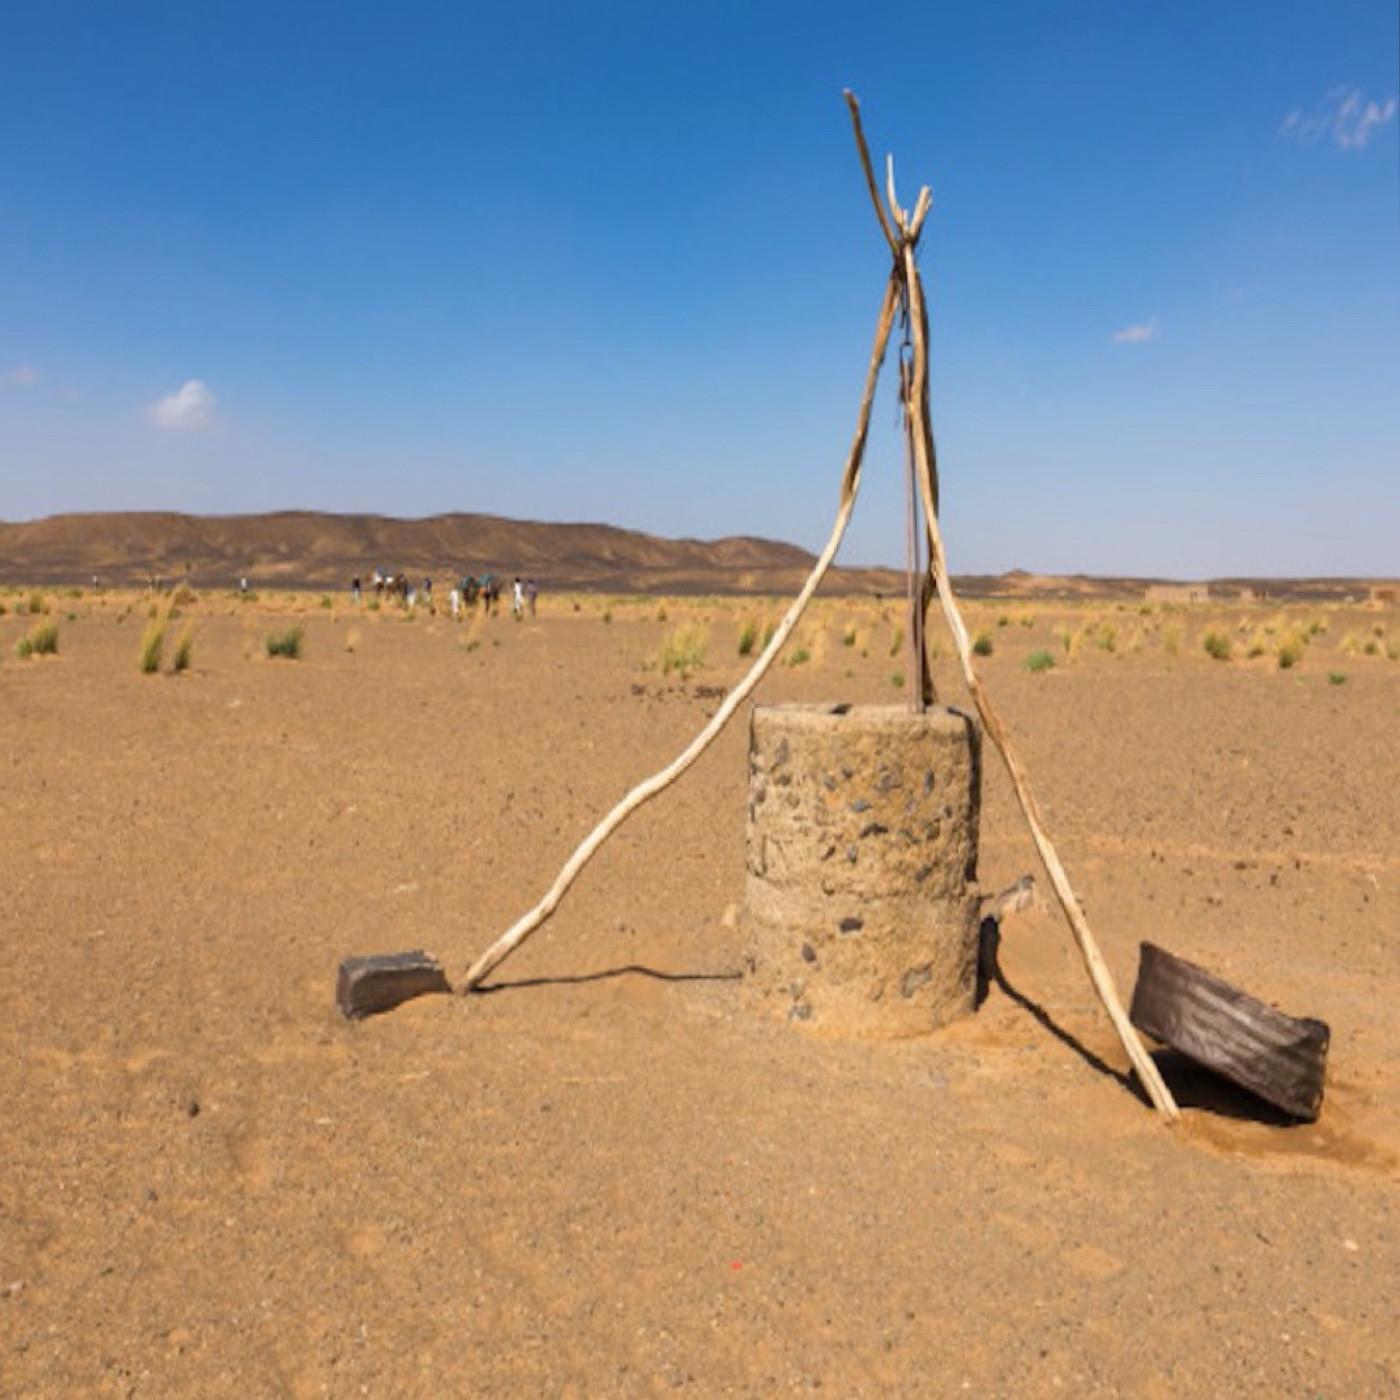 Molimbo, le gardien de l'eau